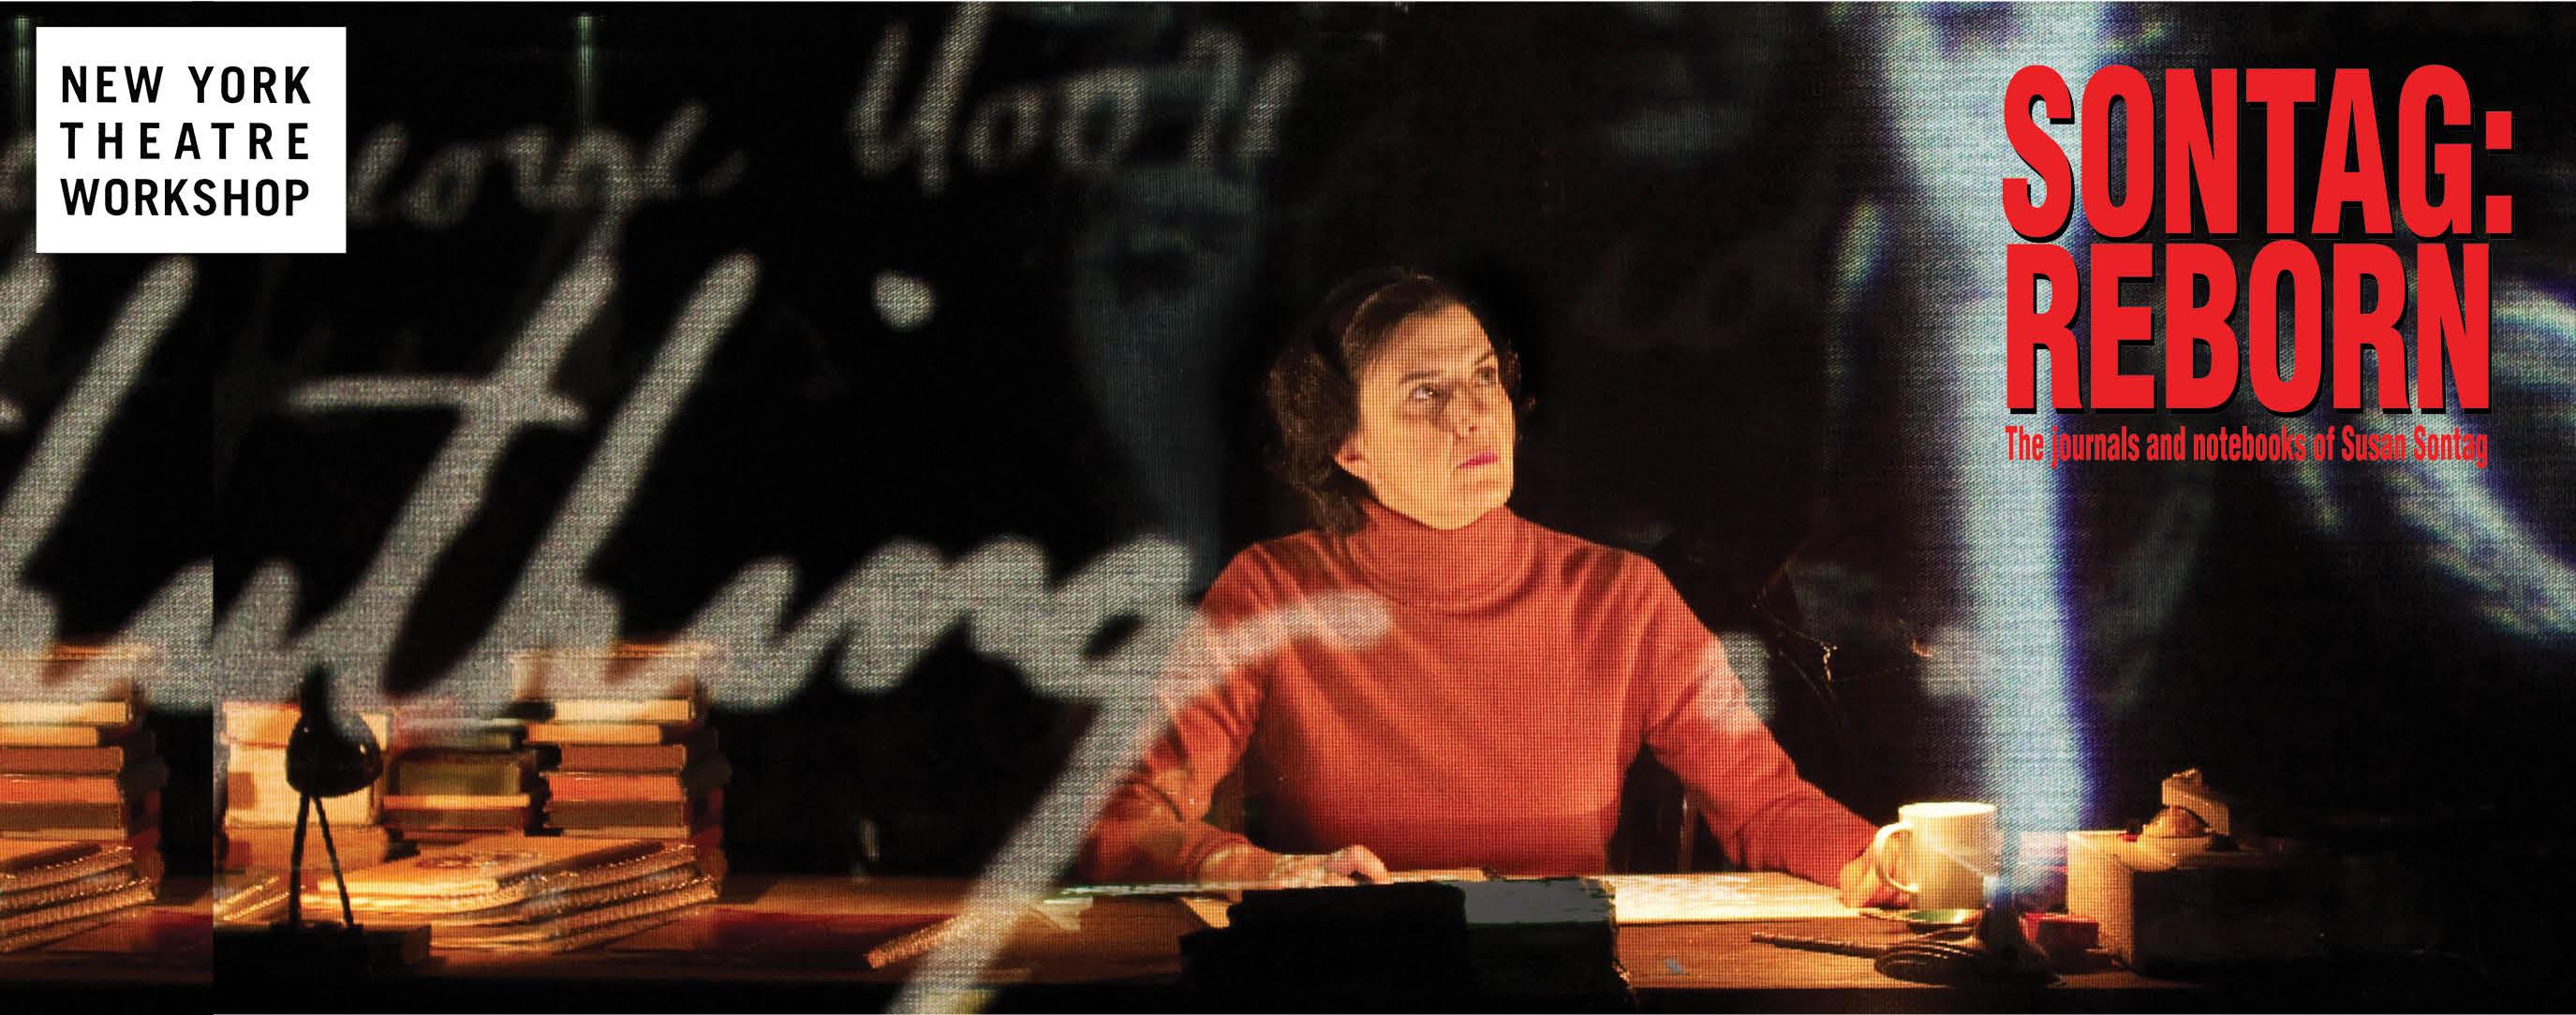 'Sontag: Reborn' at New York Theatre Workshop